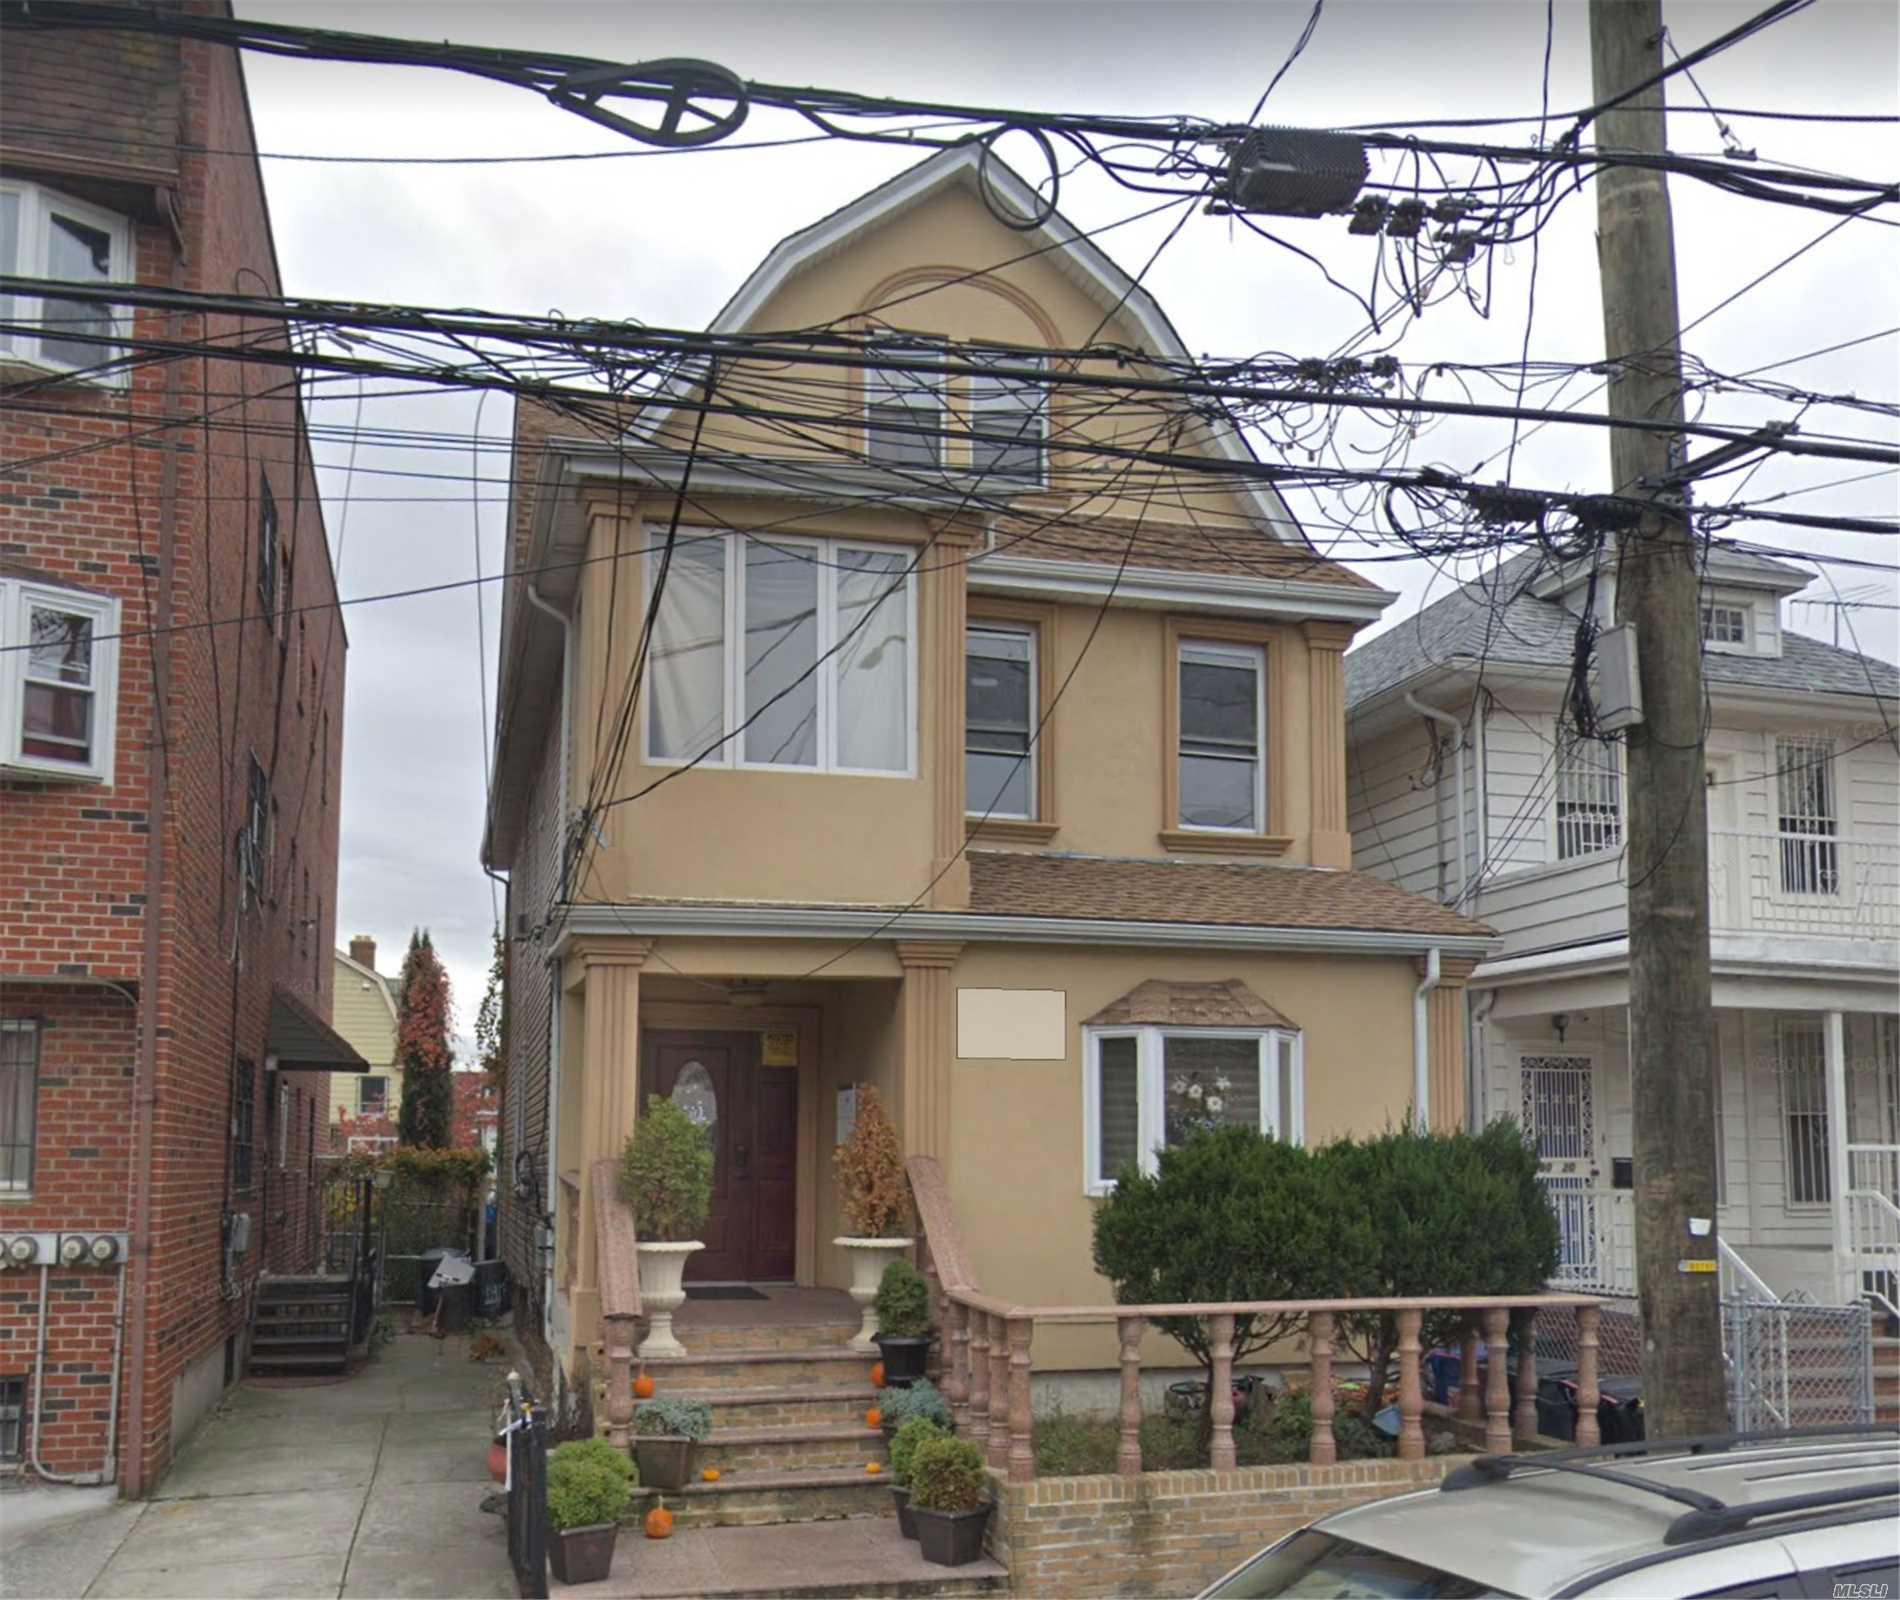 Property for sale at 90-22 52nd Avenue, Flushing NY 11380, Flushing,  New York 11380